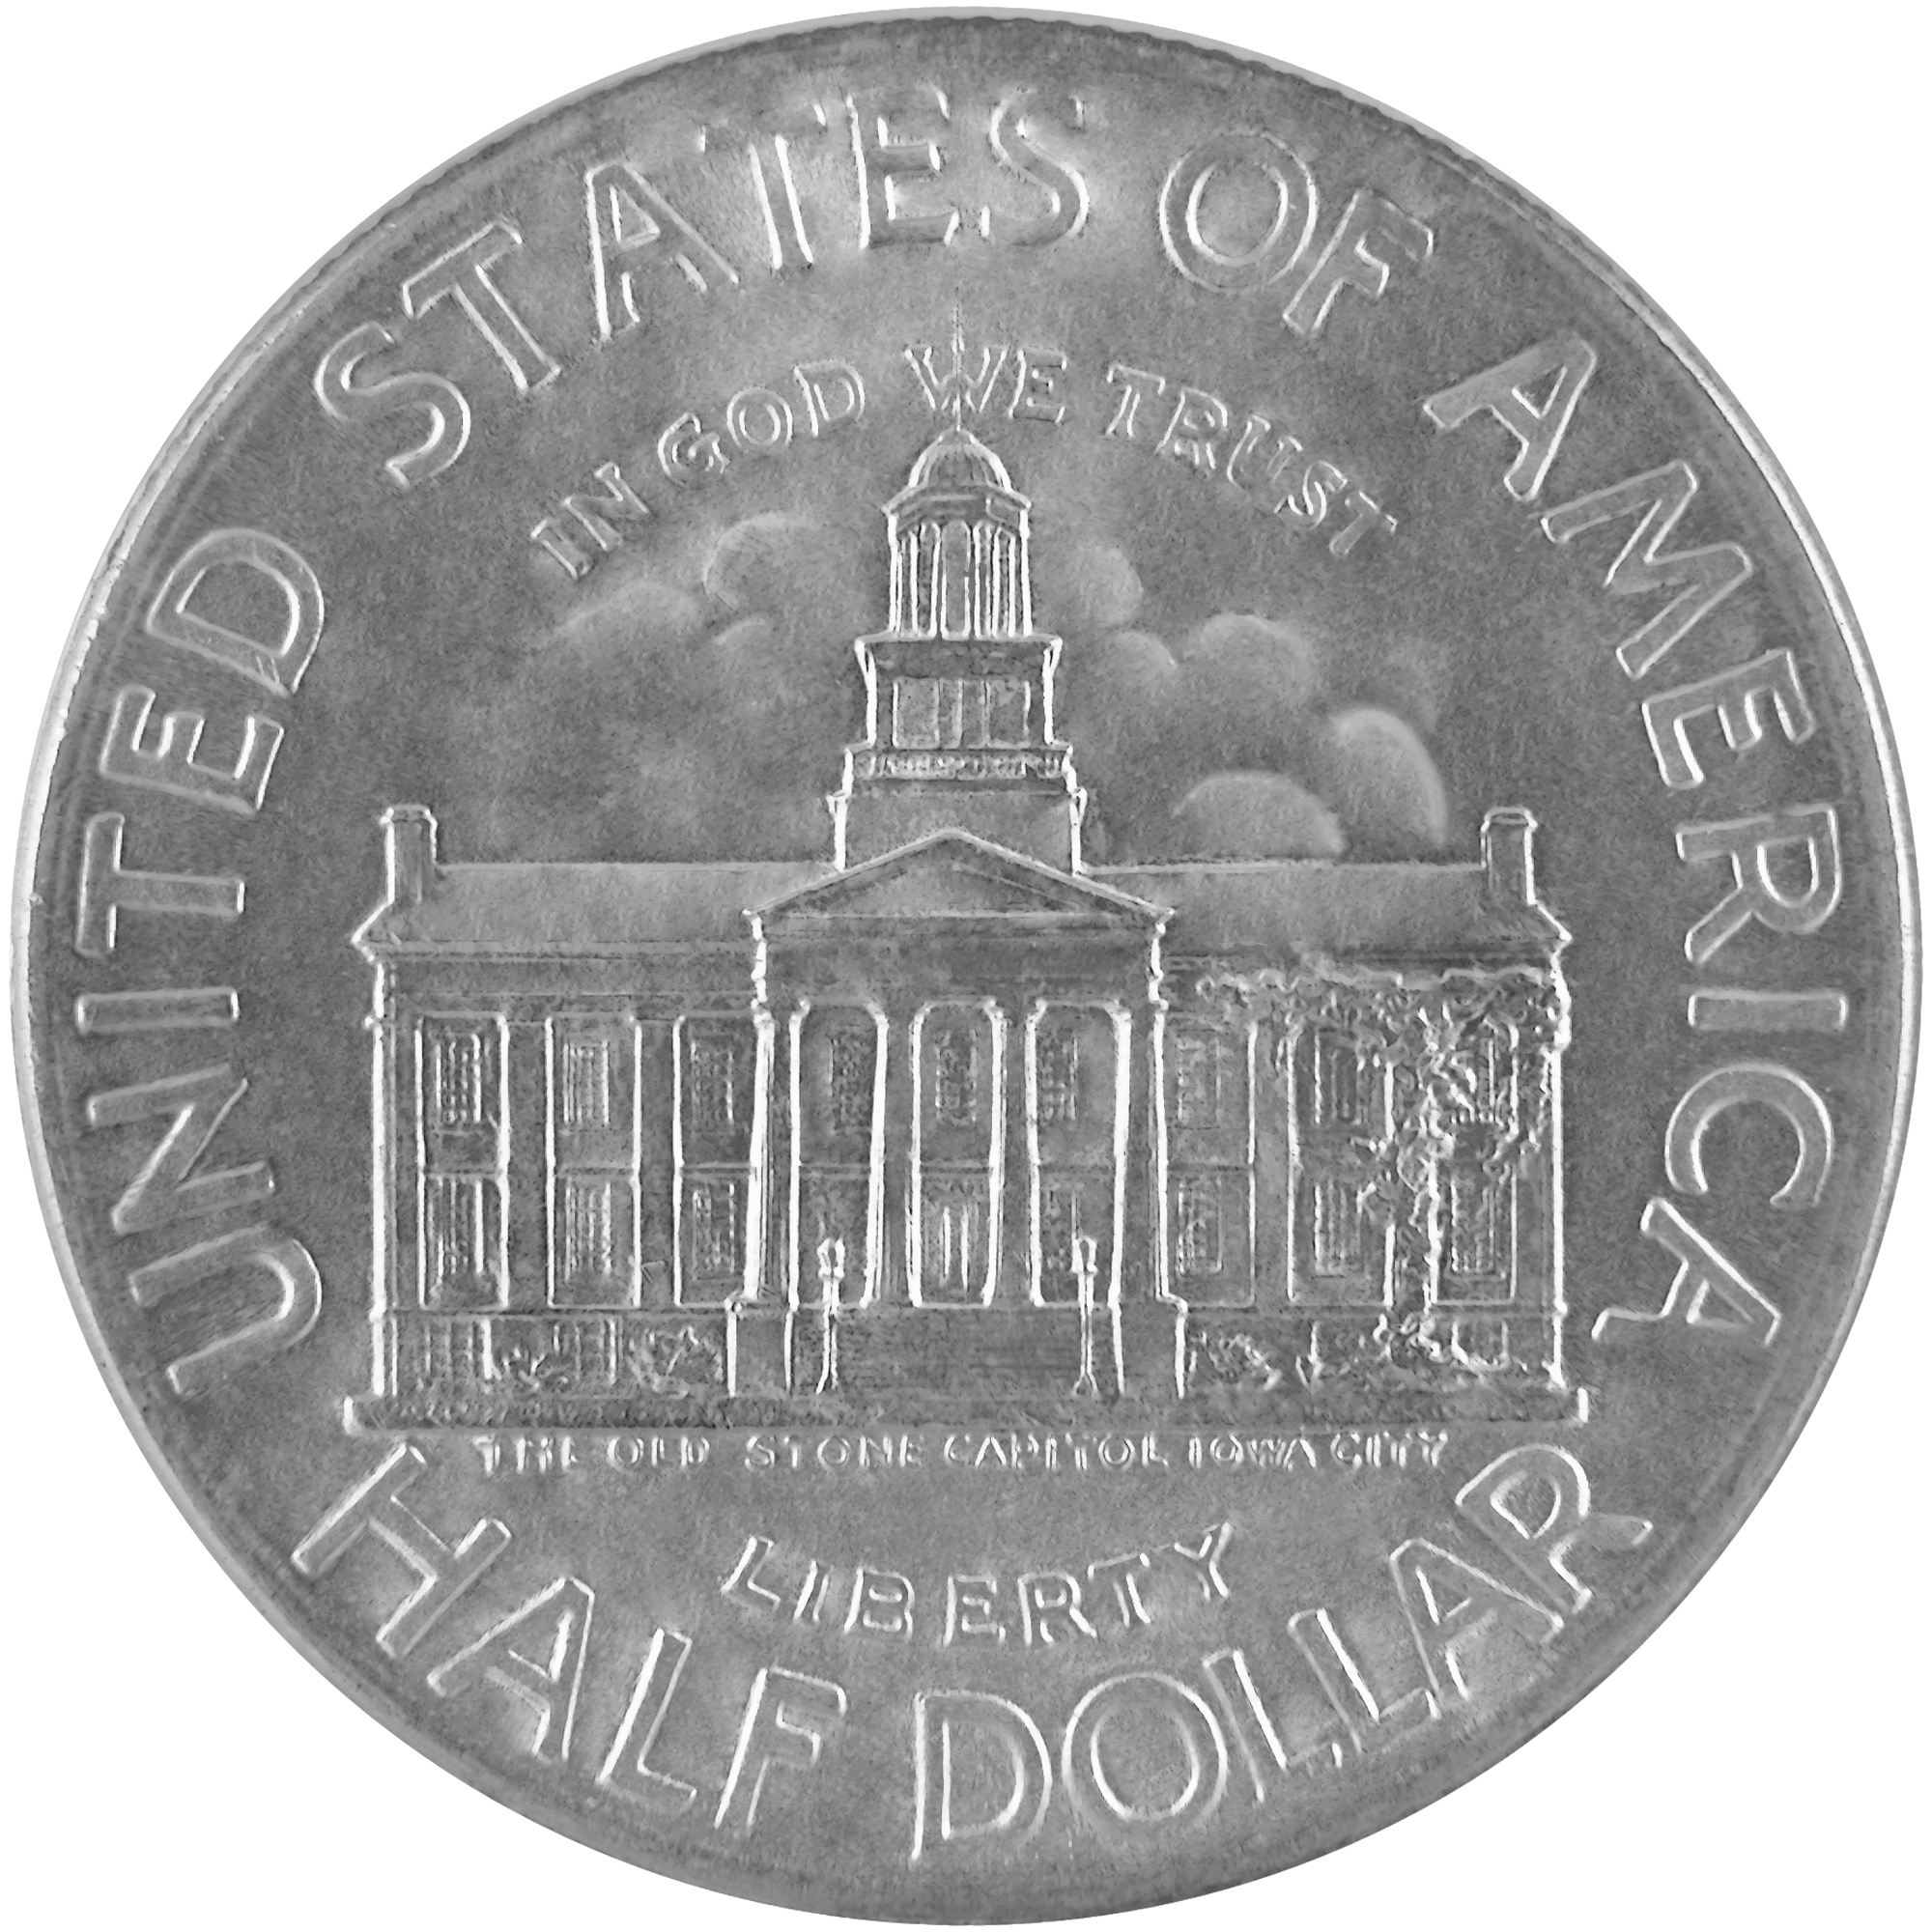 1946 Iowa Statehood Centennial Commemorative Silver Half Dollar Coin Obverse